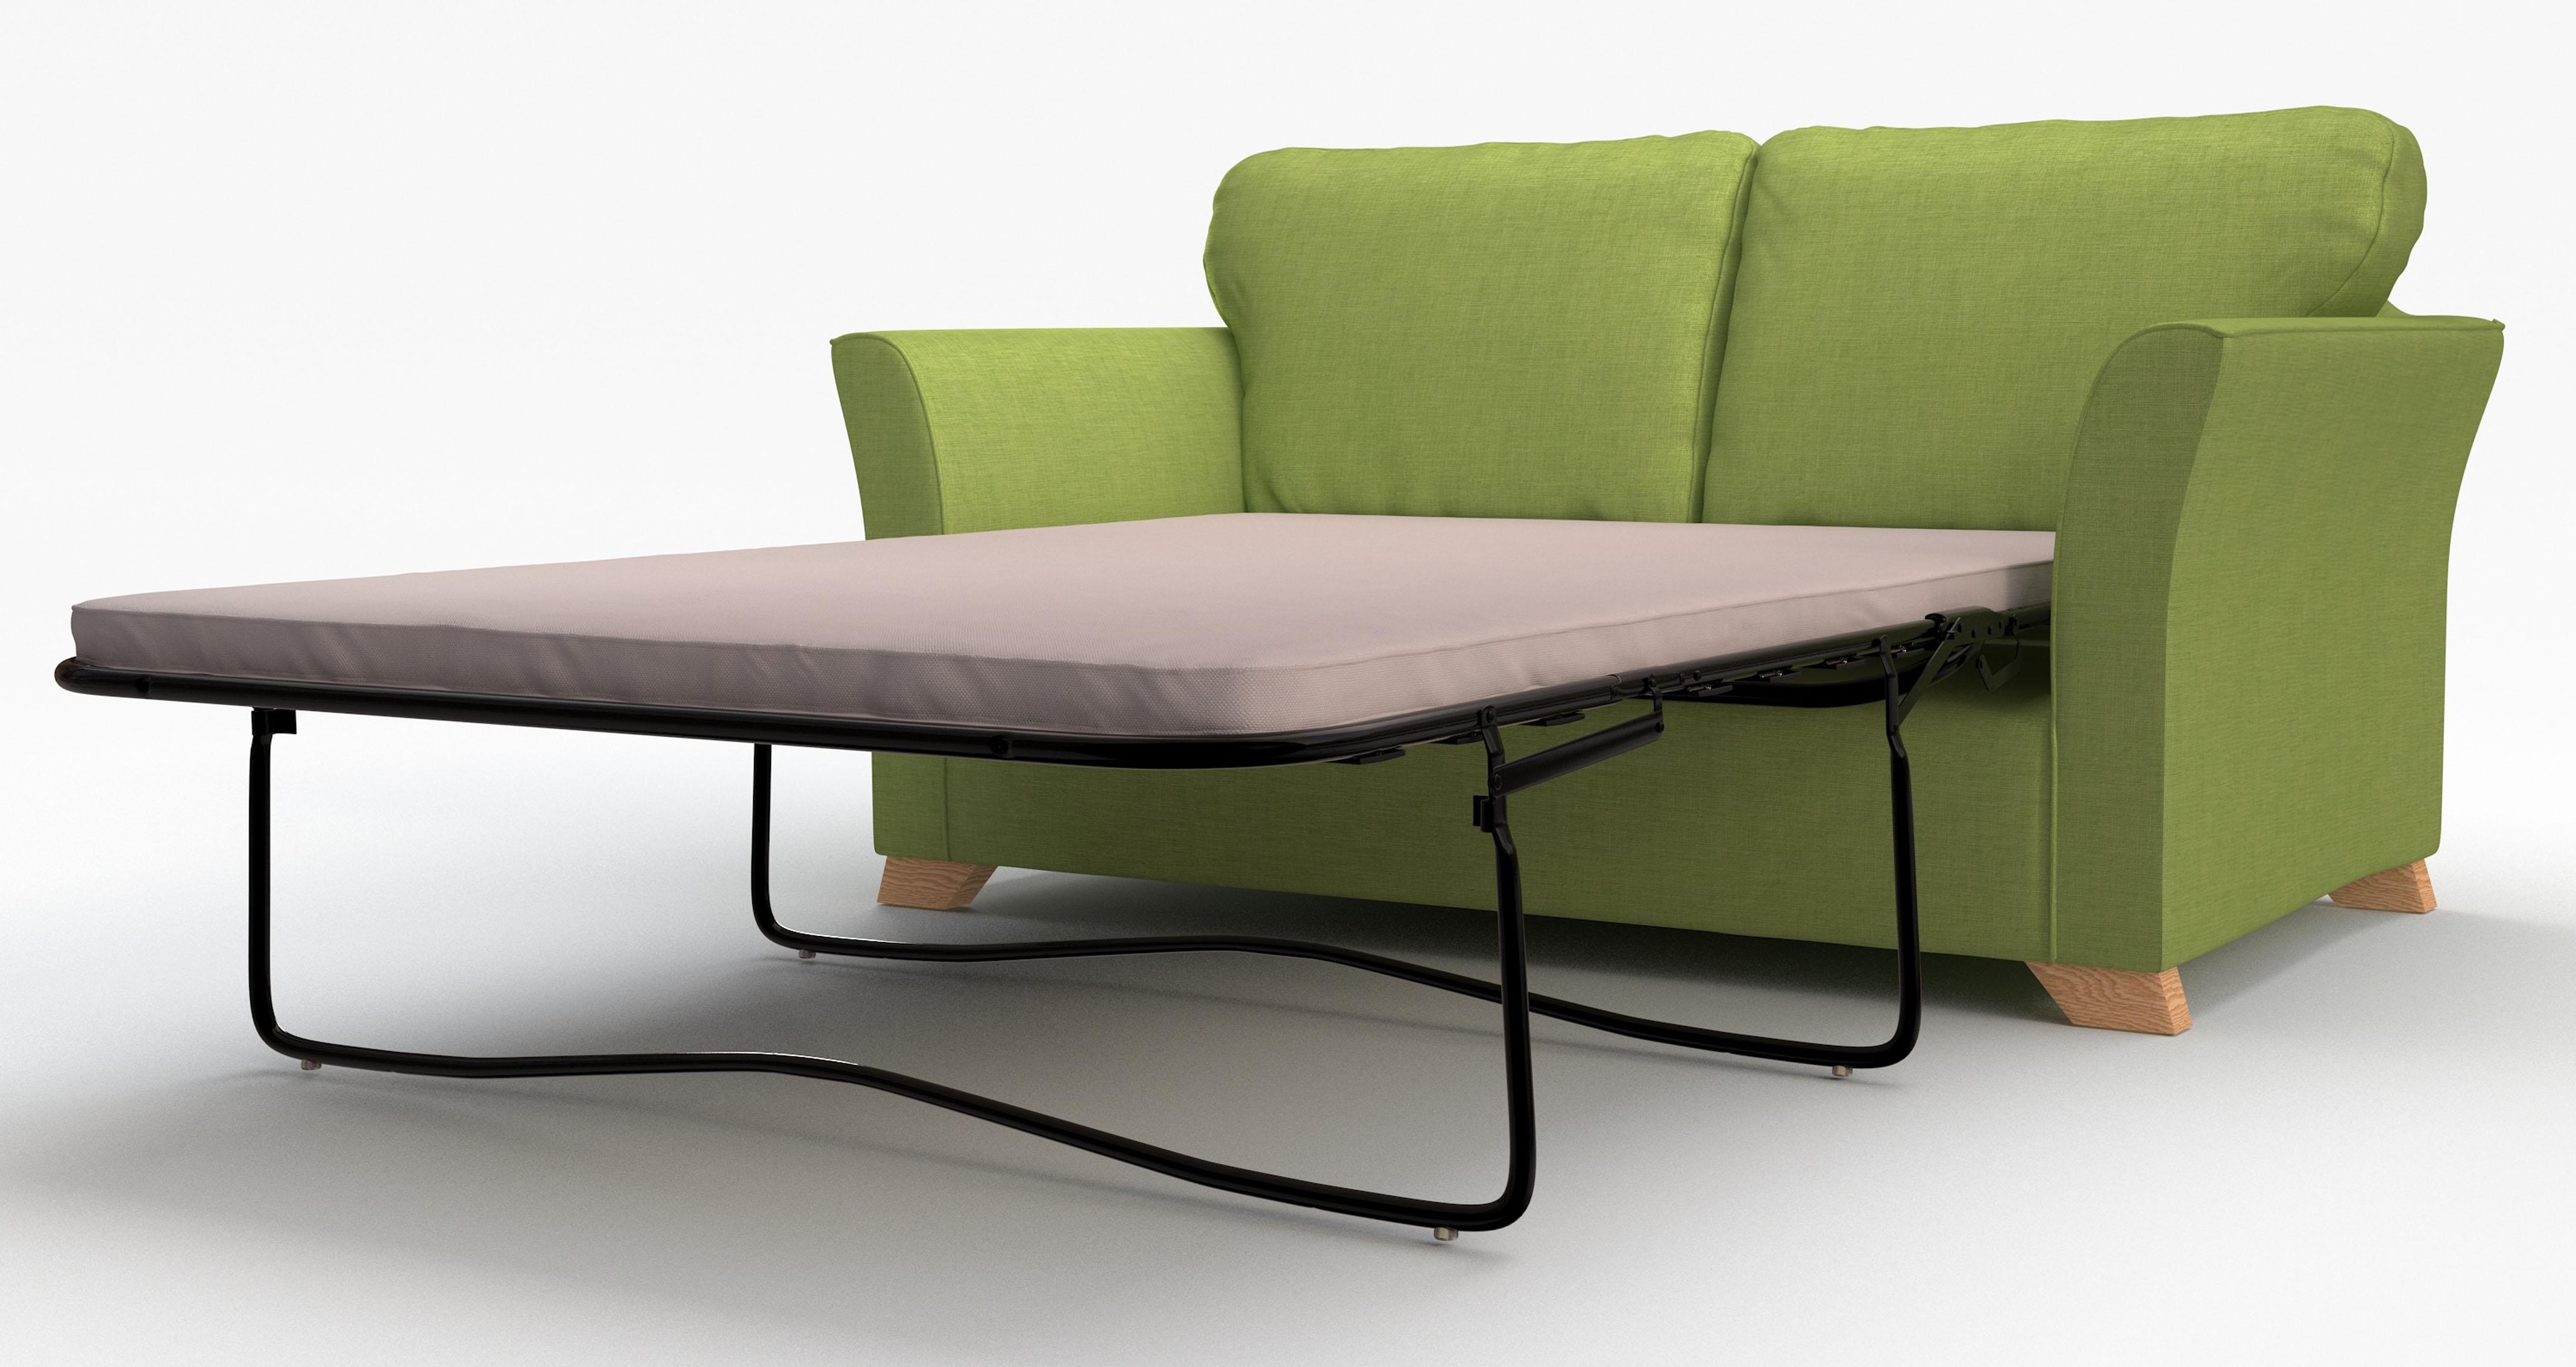 Dfs Zuma Fabric Range 3 Seater 2 Str Sofa Bed